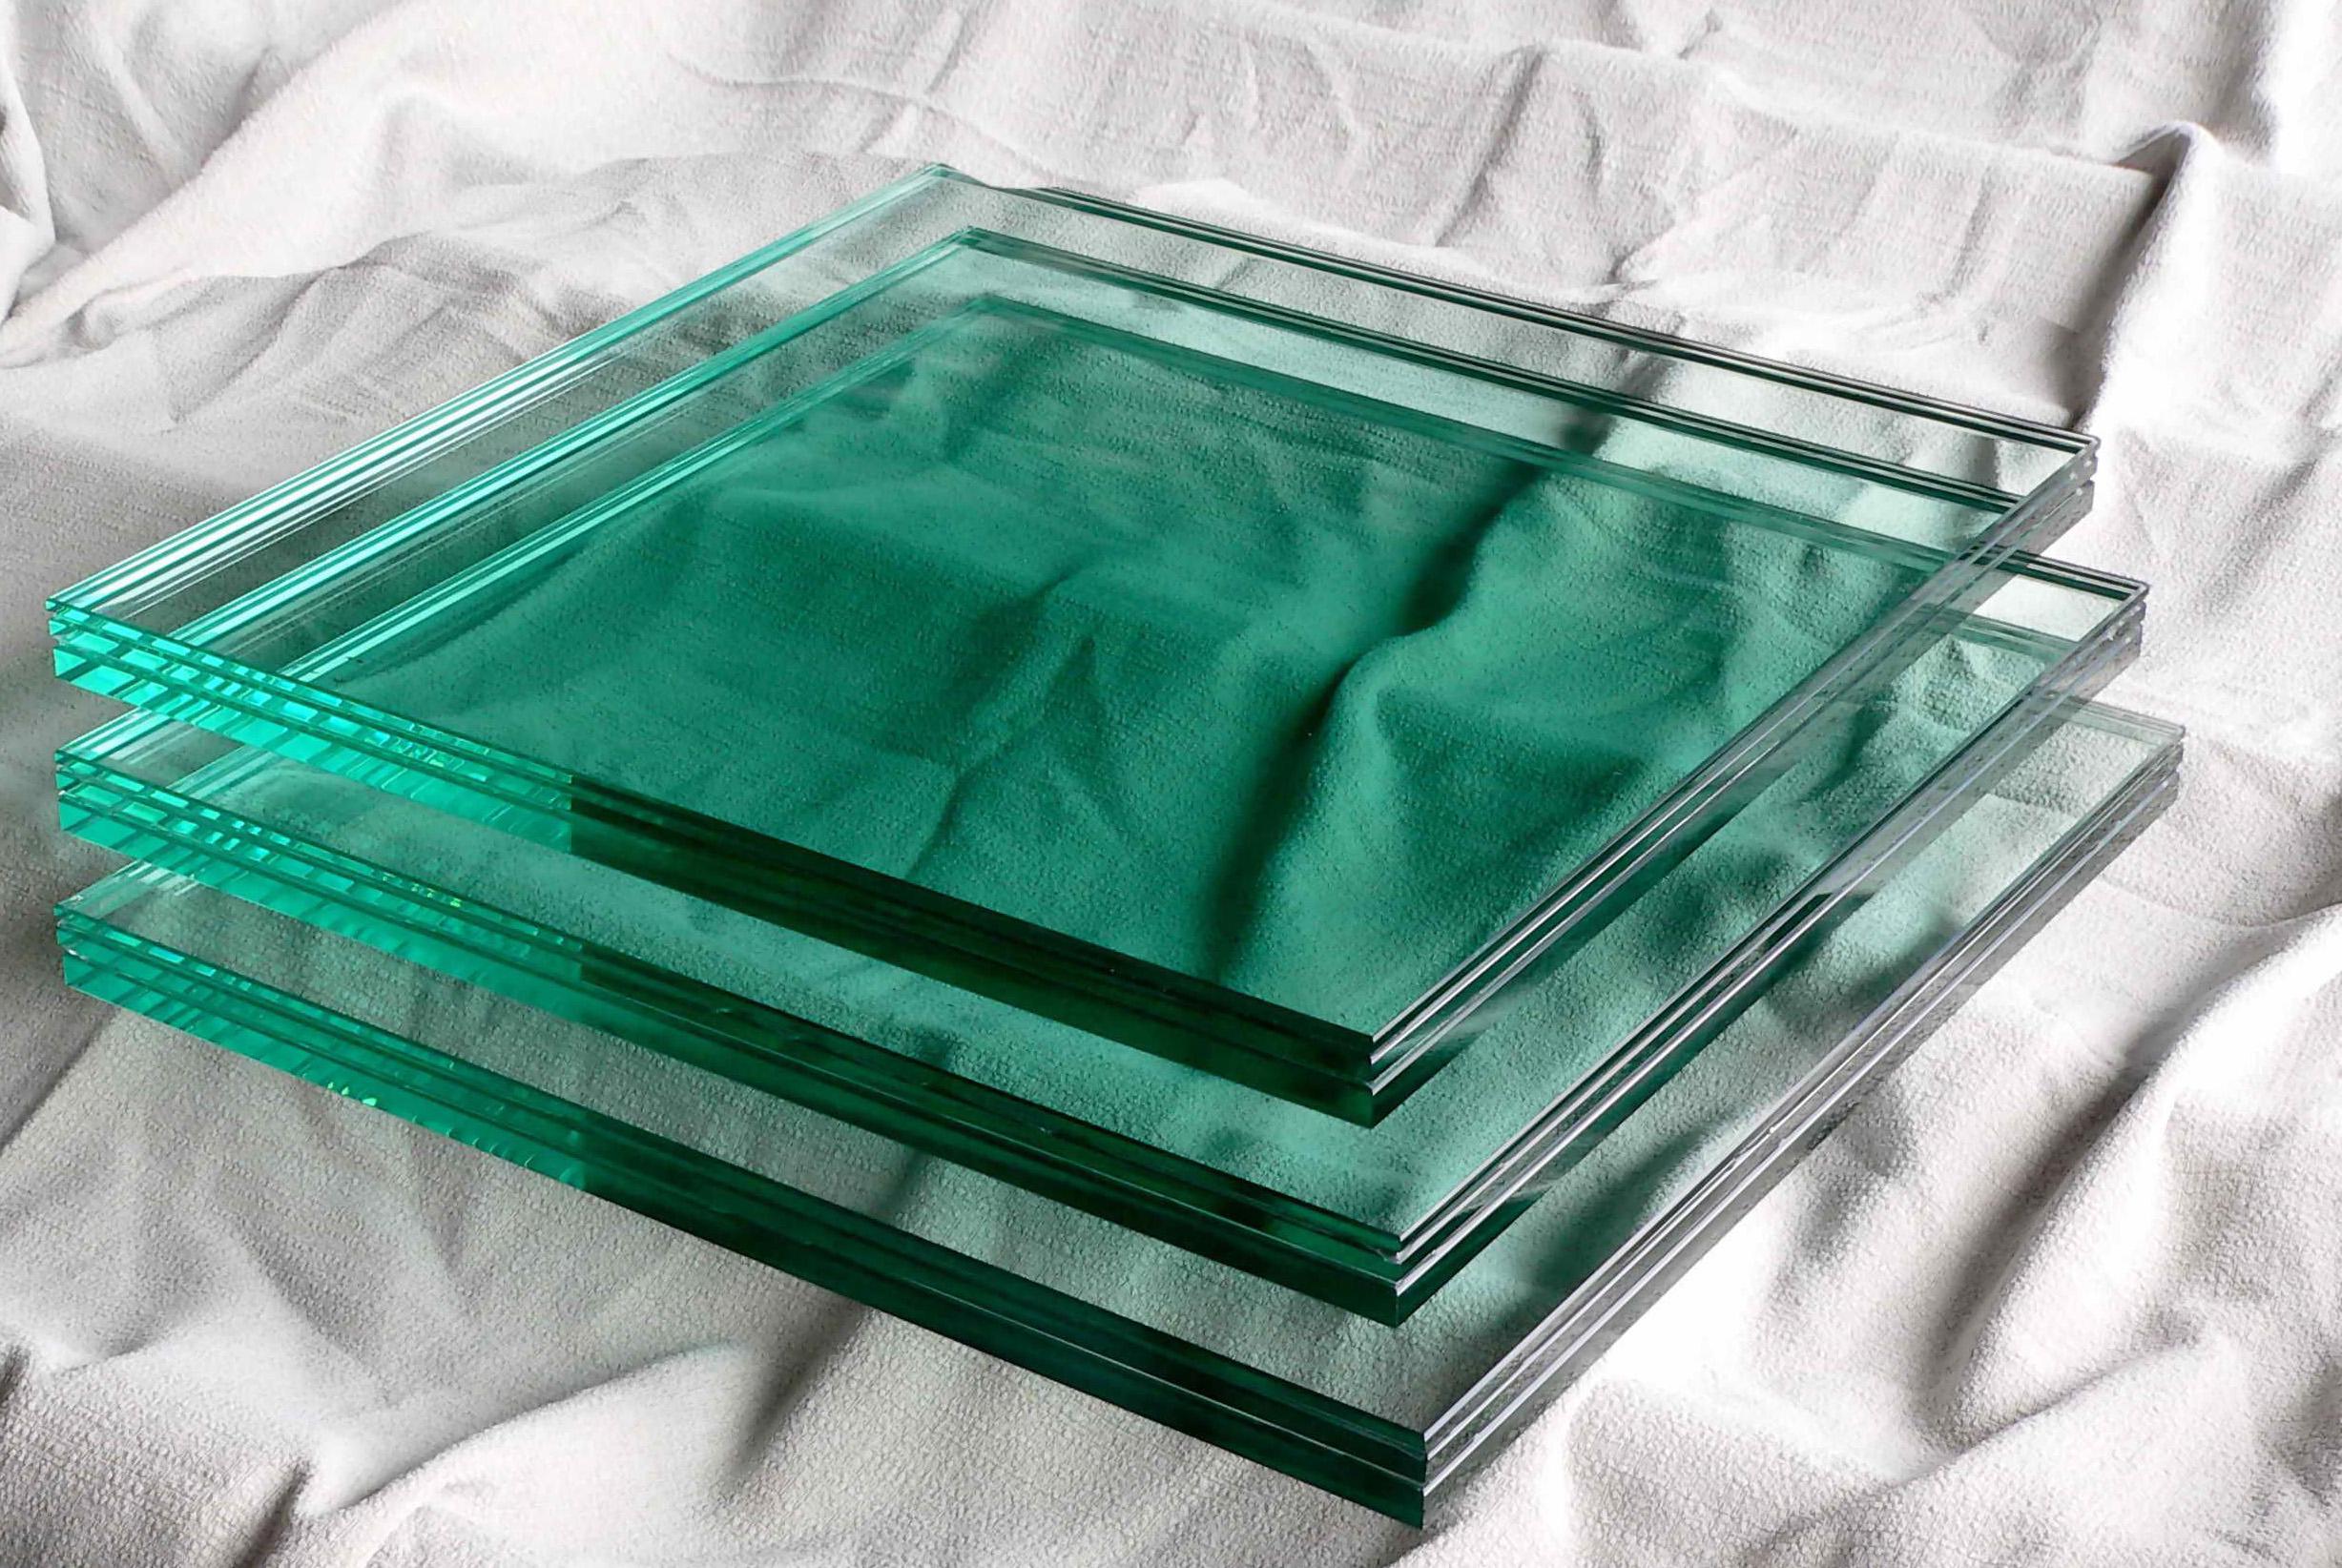 bigglass copy.jpg